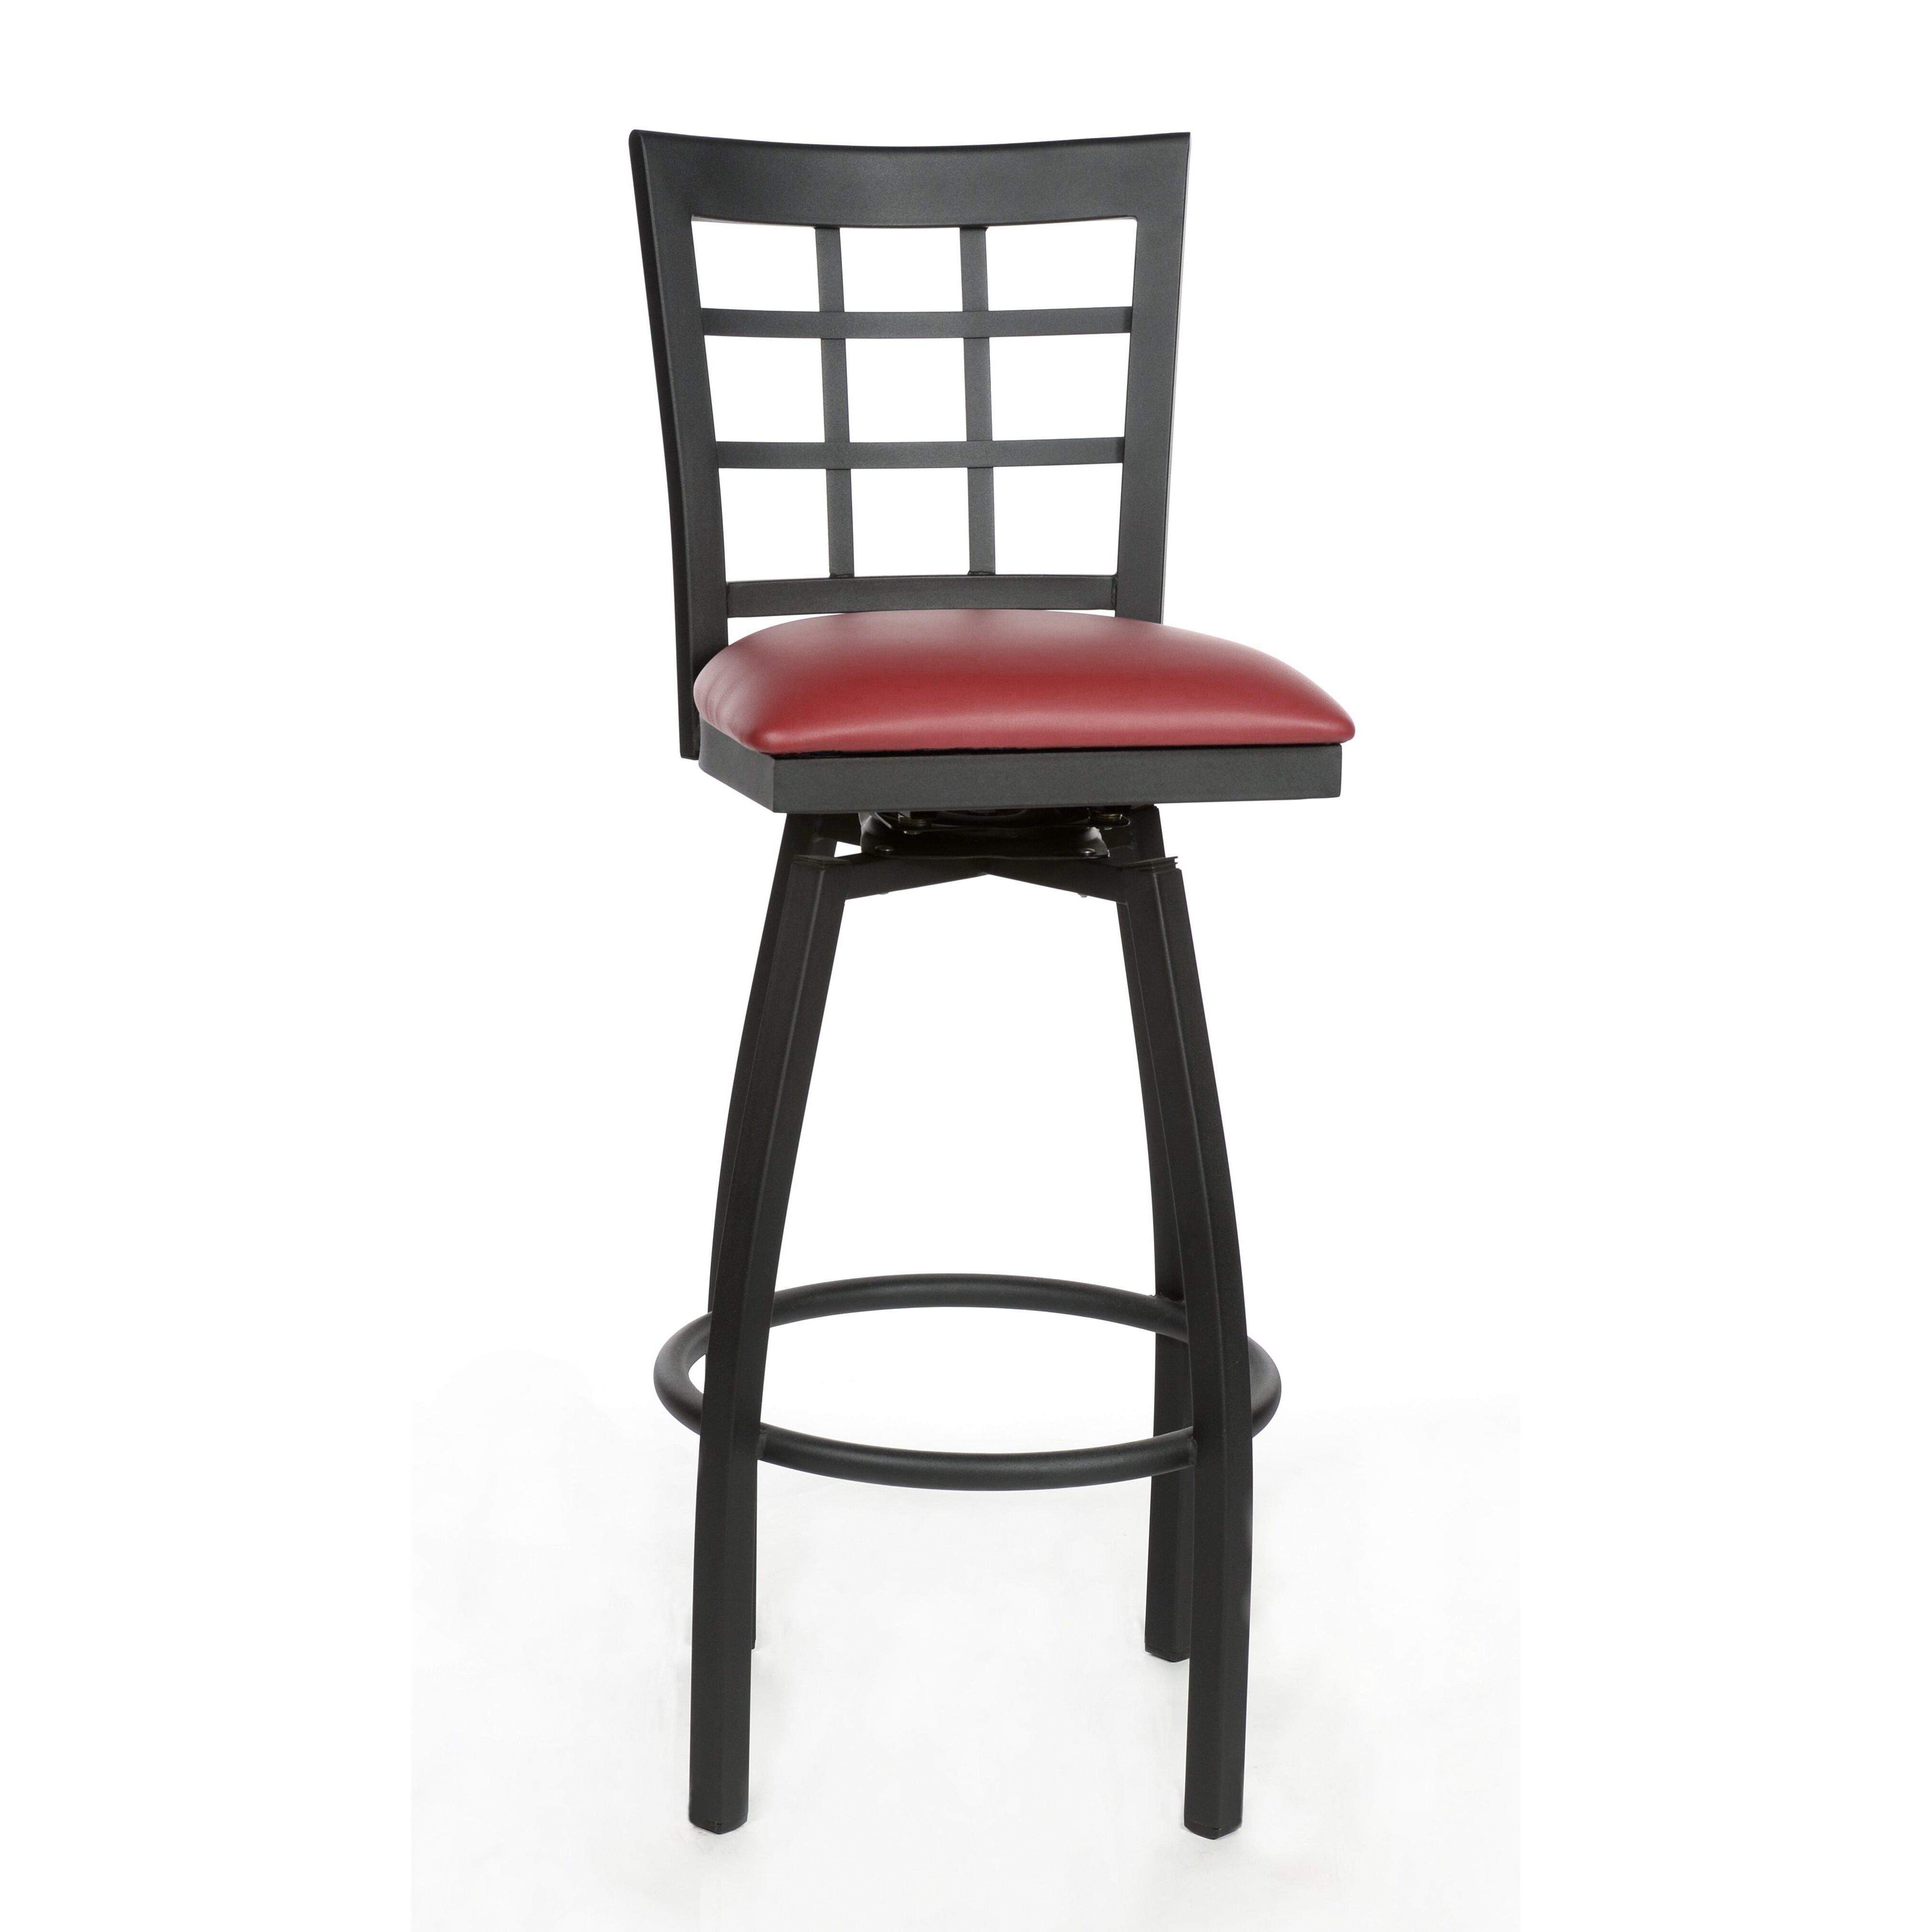 DanielPaulChairs 31quot Swivel Bar Stool with Cushion Wayfair : Daniel Paul Chairs 31 Swivel Bar Stool with Cushion from www.wayfair.com size 4038 x 4038 jpeg 567kB